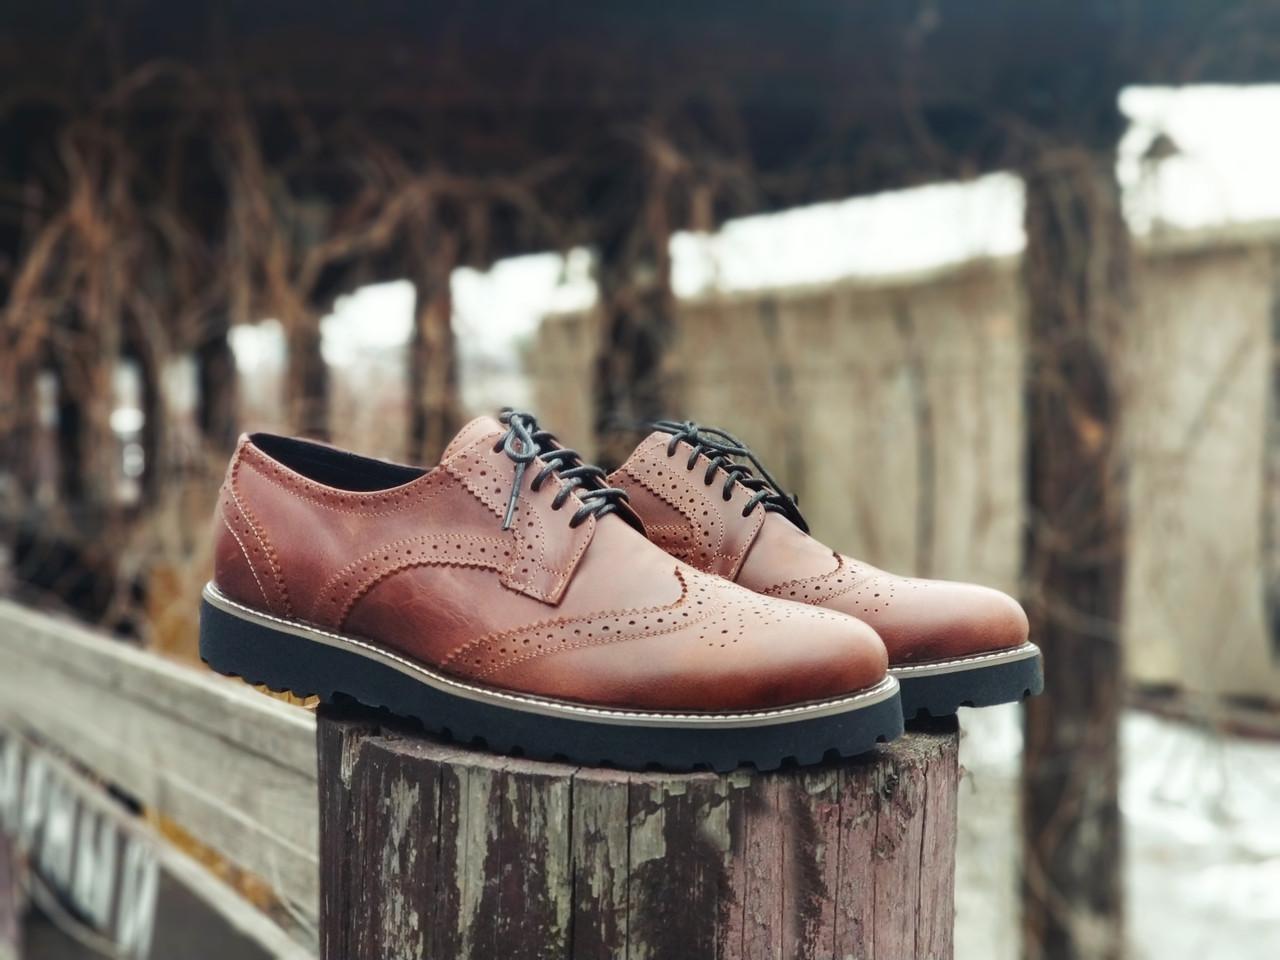 fc0cbc3f3 Туфли броги мужские коричневые кожаные (Onyx) от бренда Legessy размер 40,  41,